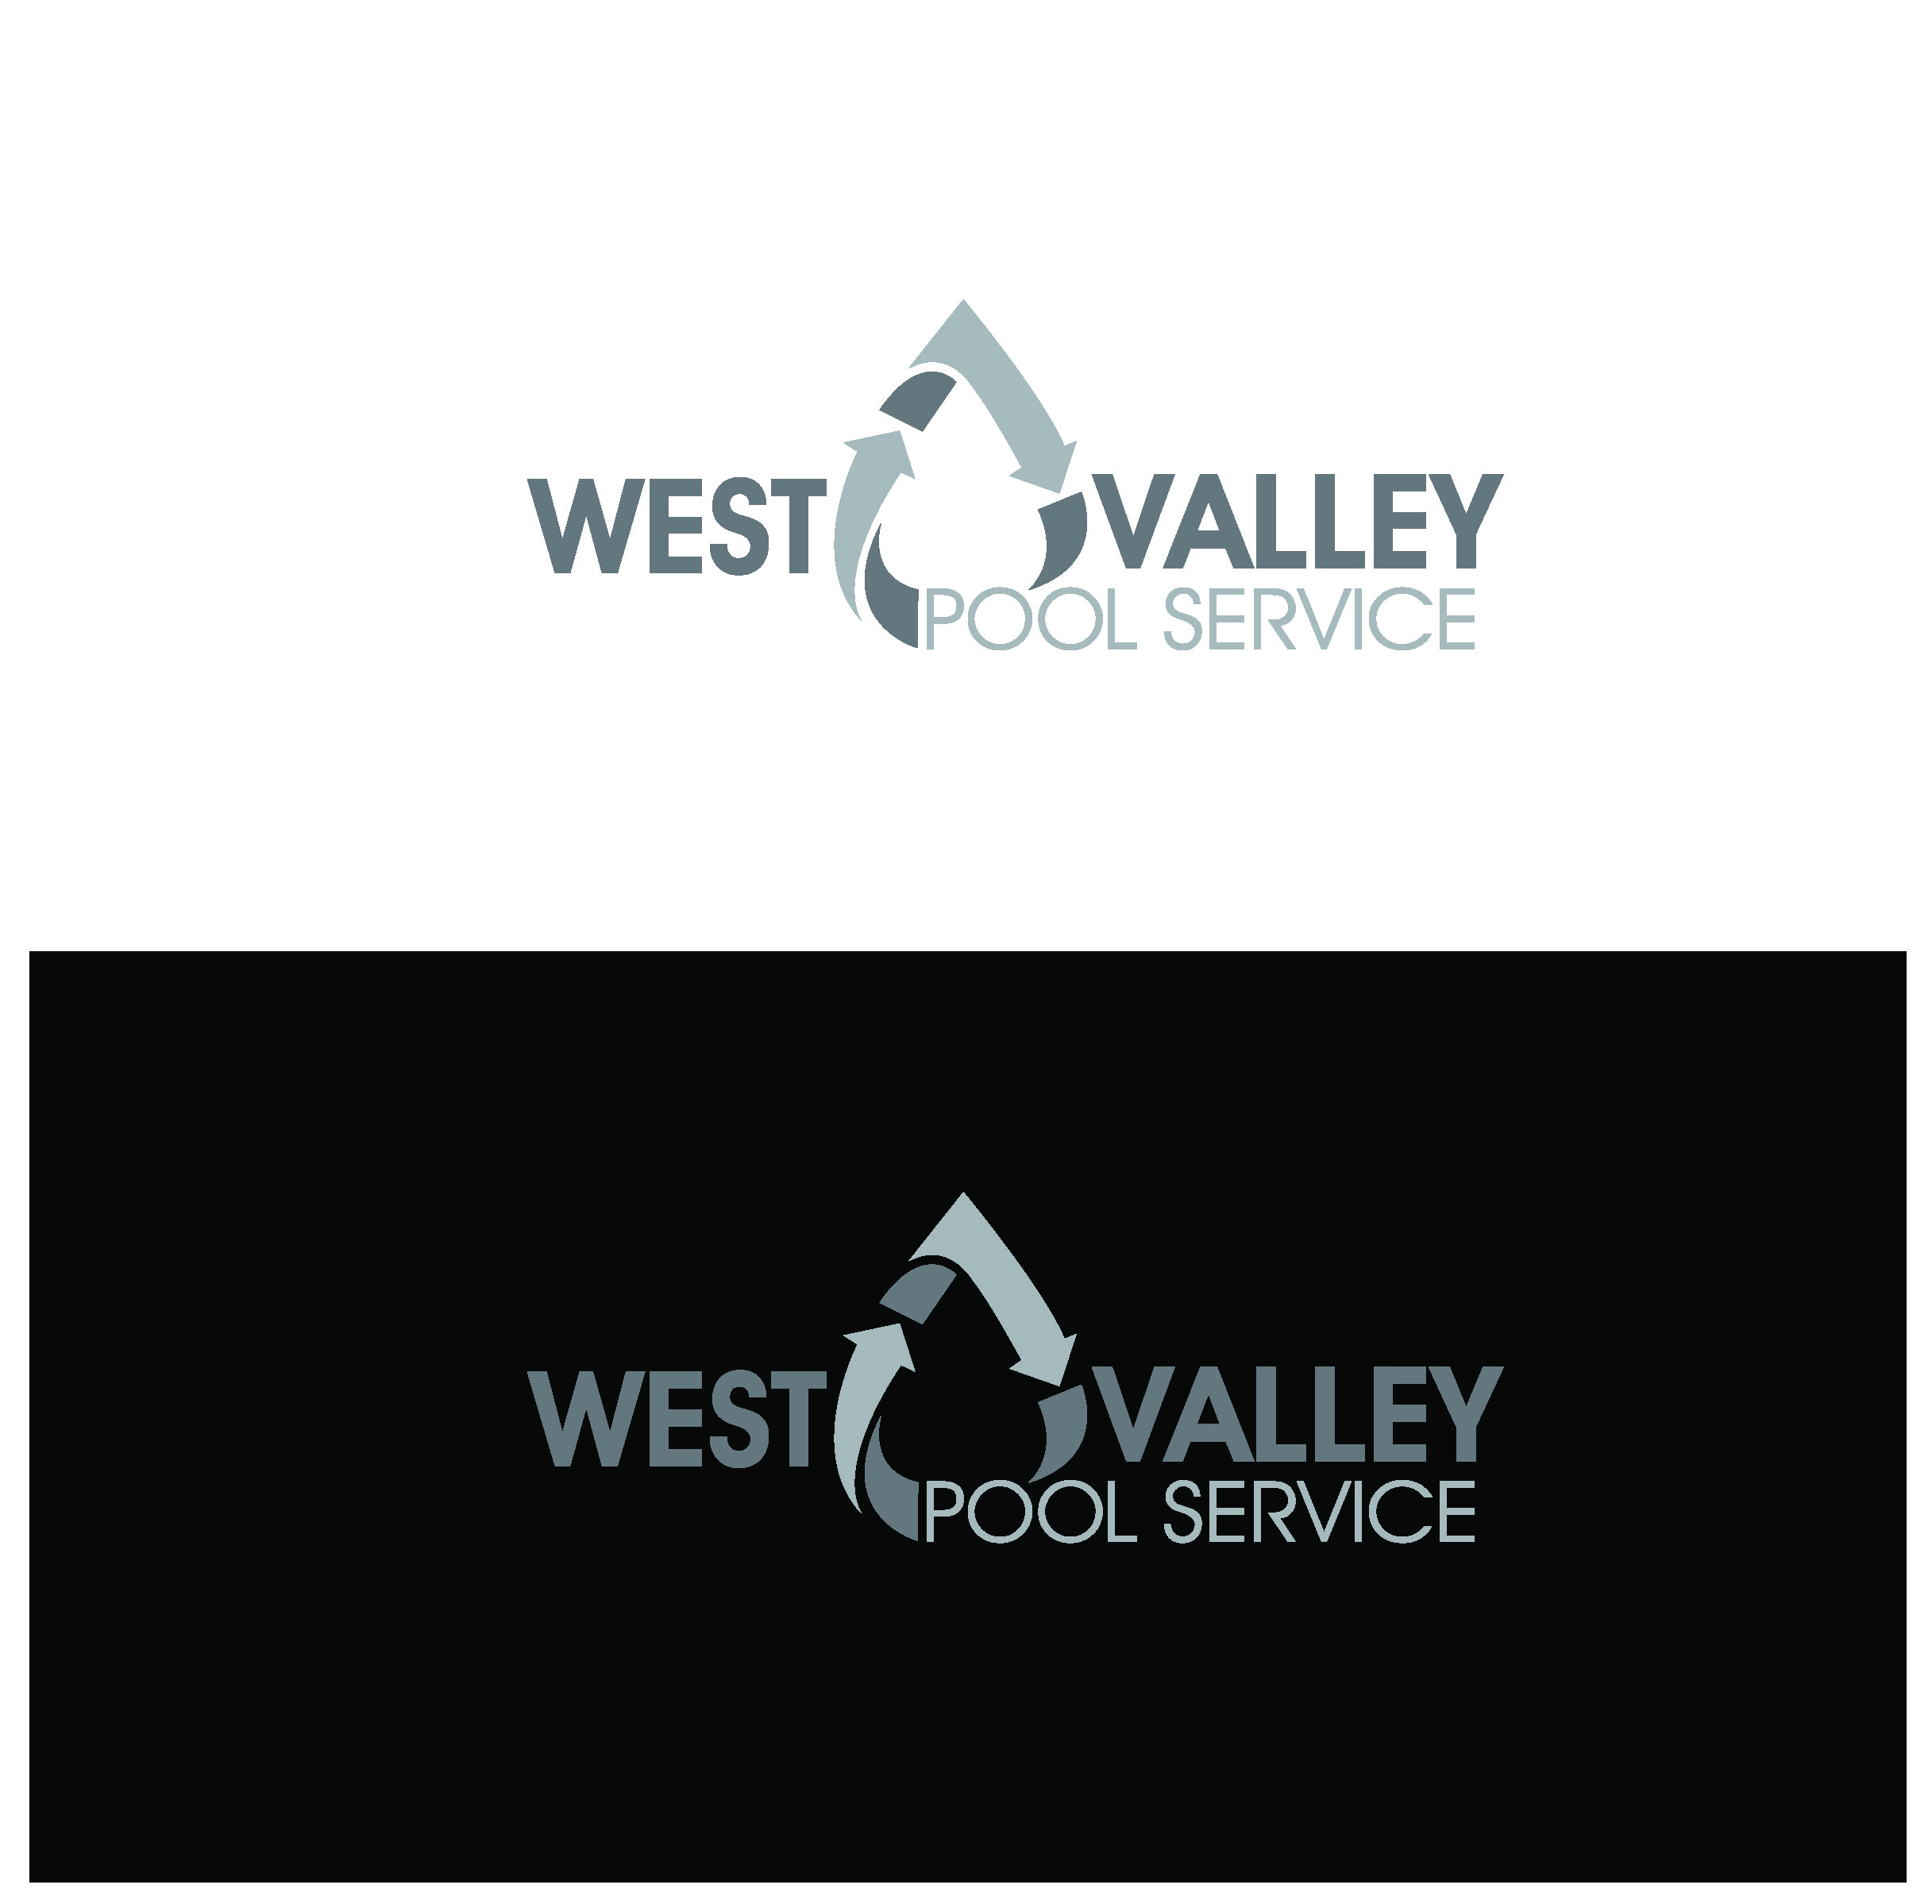 Logo Design by Sampath Gunathilaka - Entry No. 92 in the Logo Design Contest Clever Logo Design for West Valley Pool Service.